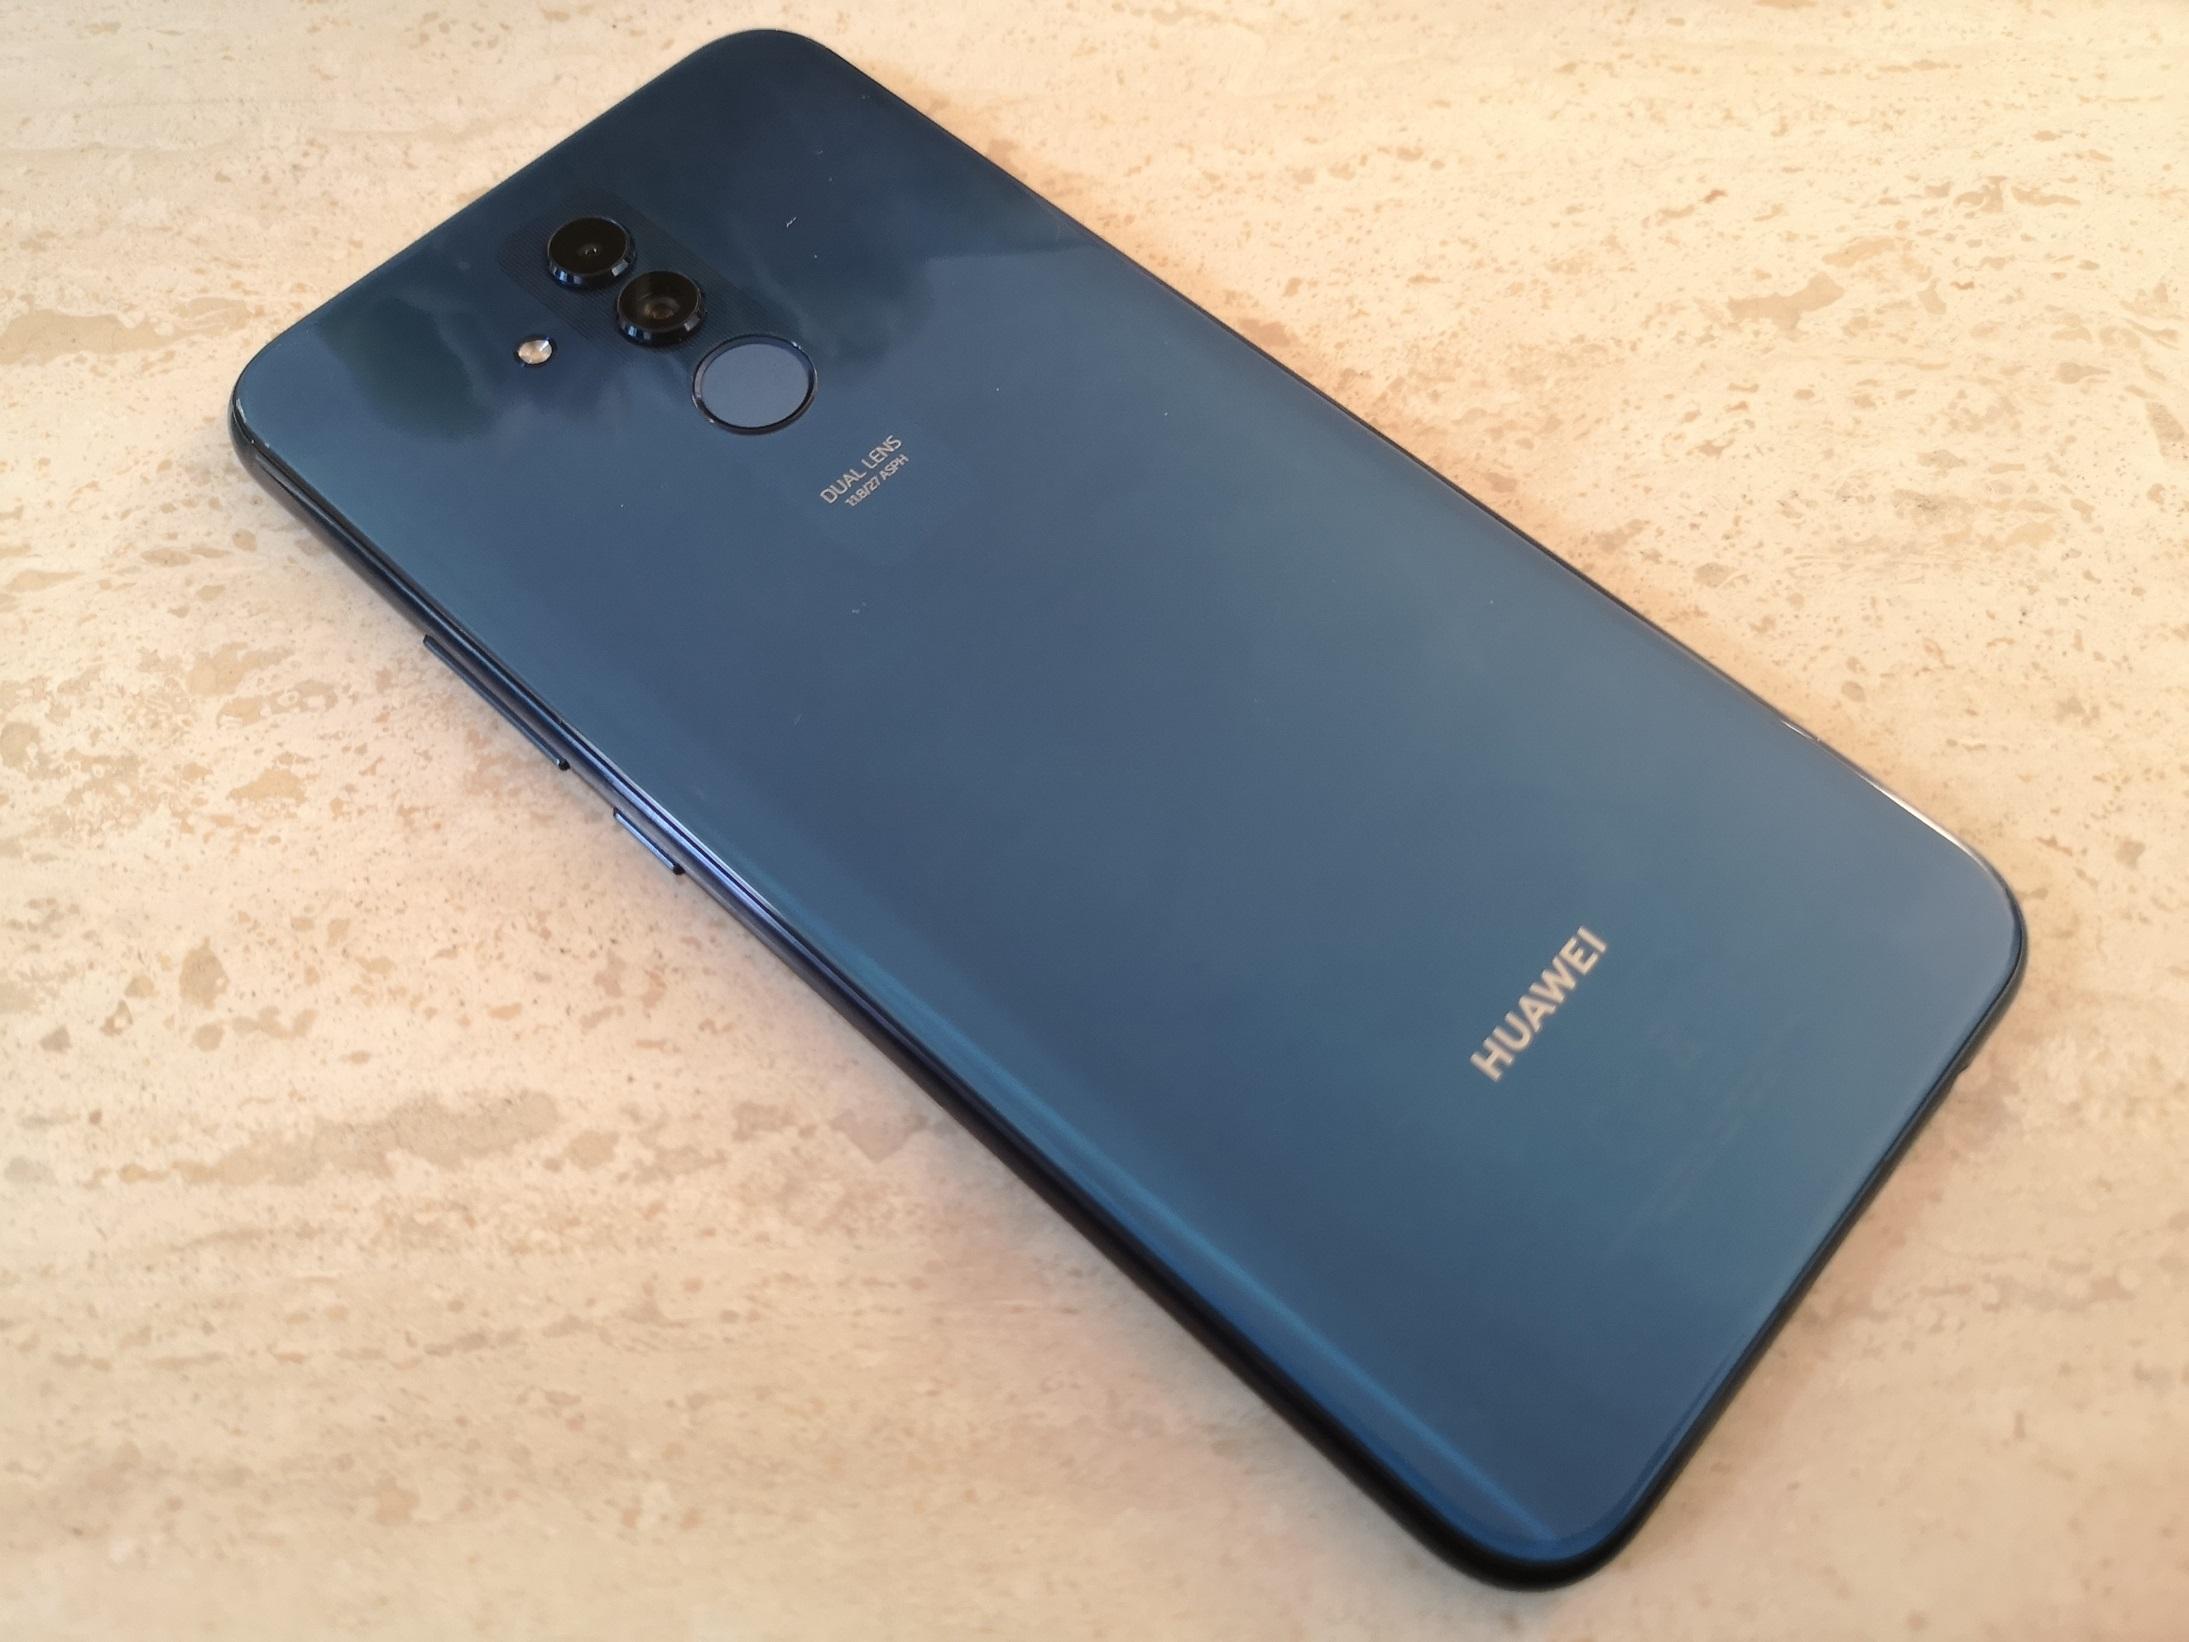 Huawei Mate 20 Lite test 3 - [ Prise en main IFA 2018 ] Huawei Mate 20 Lite : déjà une référence ?